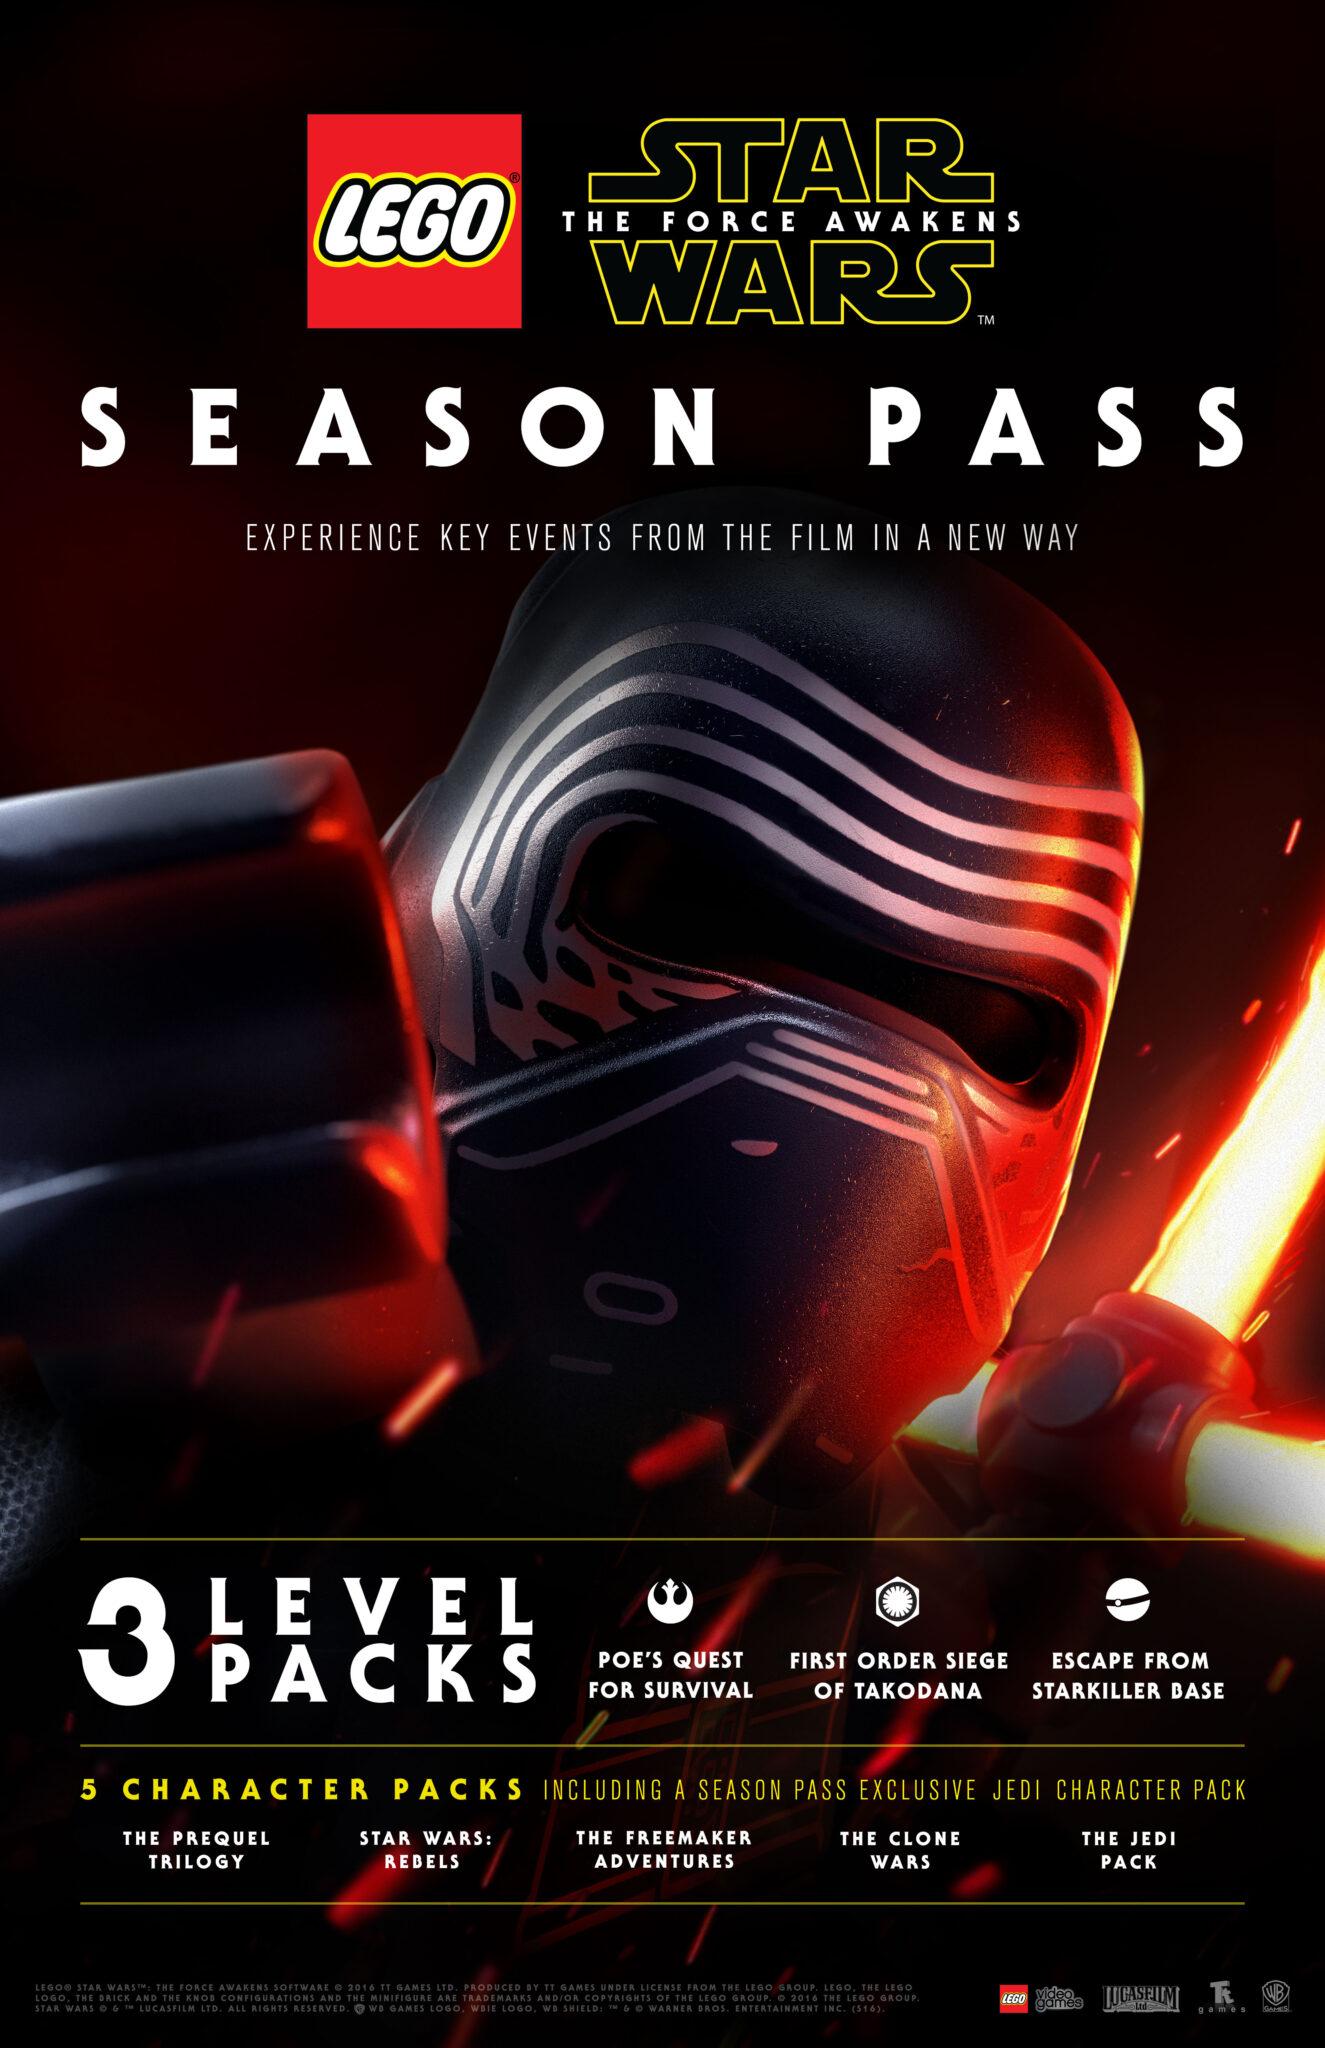 Lego star wars iii the clone wars vehicle info - Lsw_seasonpasskeyart_1464246435